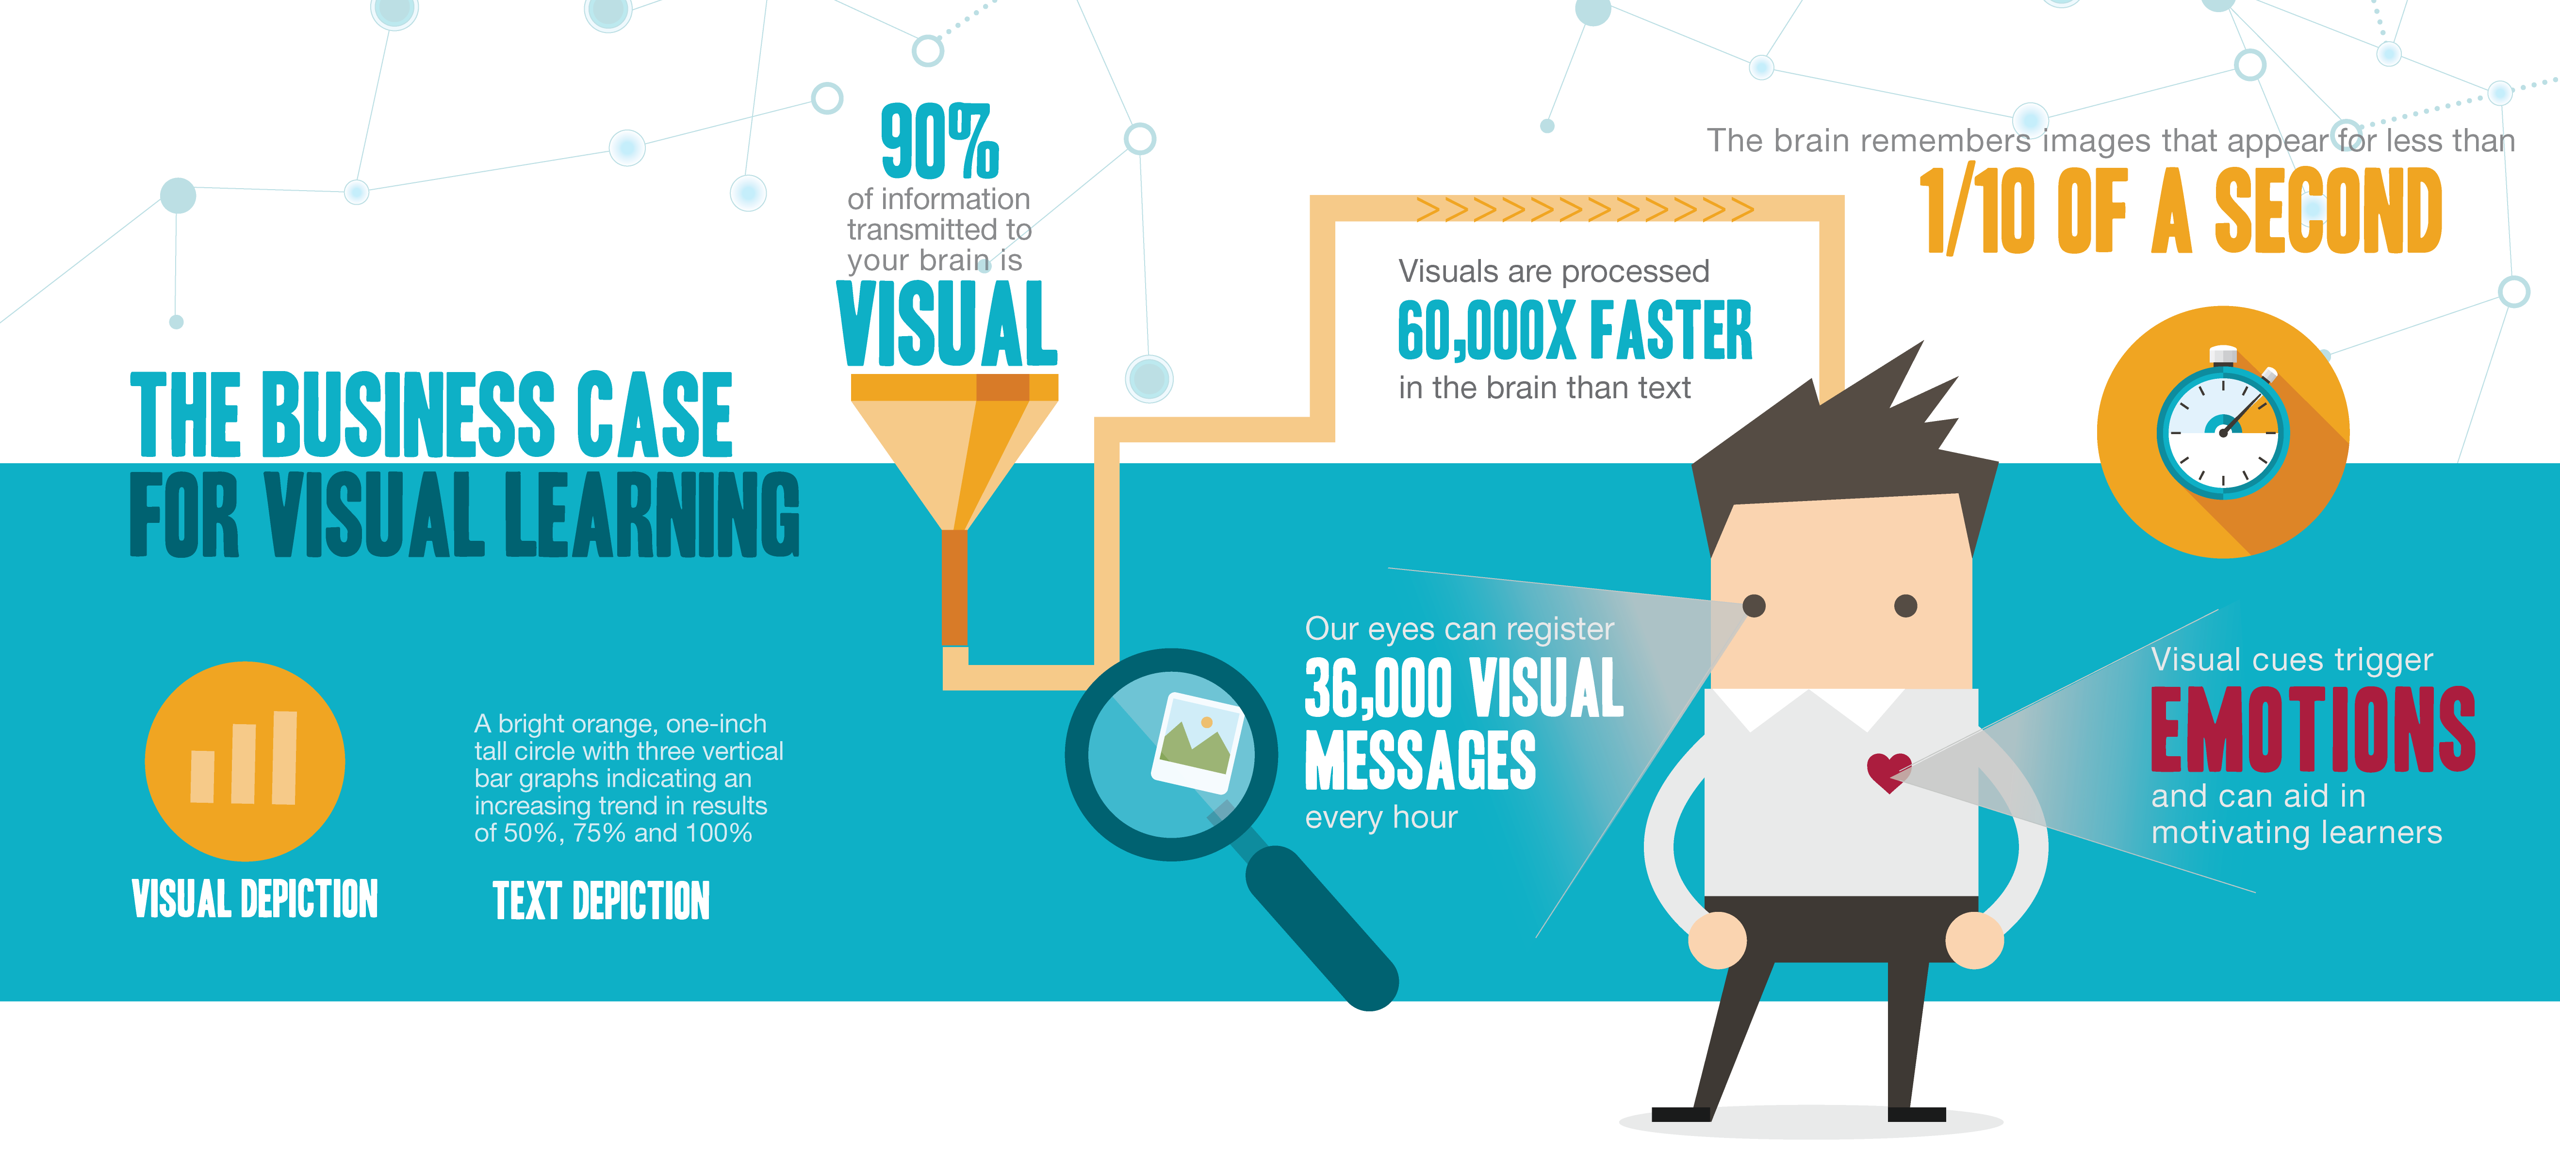 roi-comm-blog-infographic-01